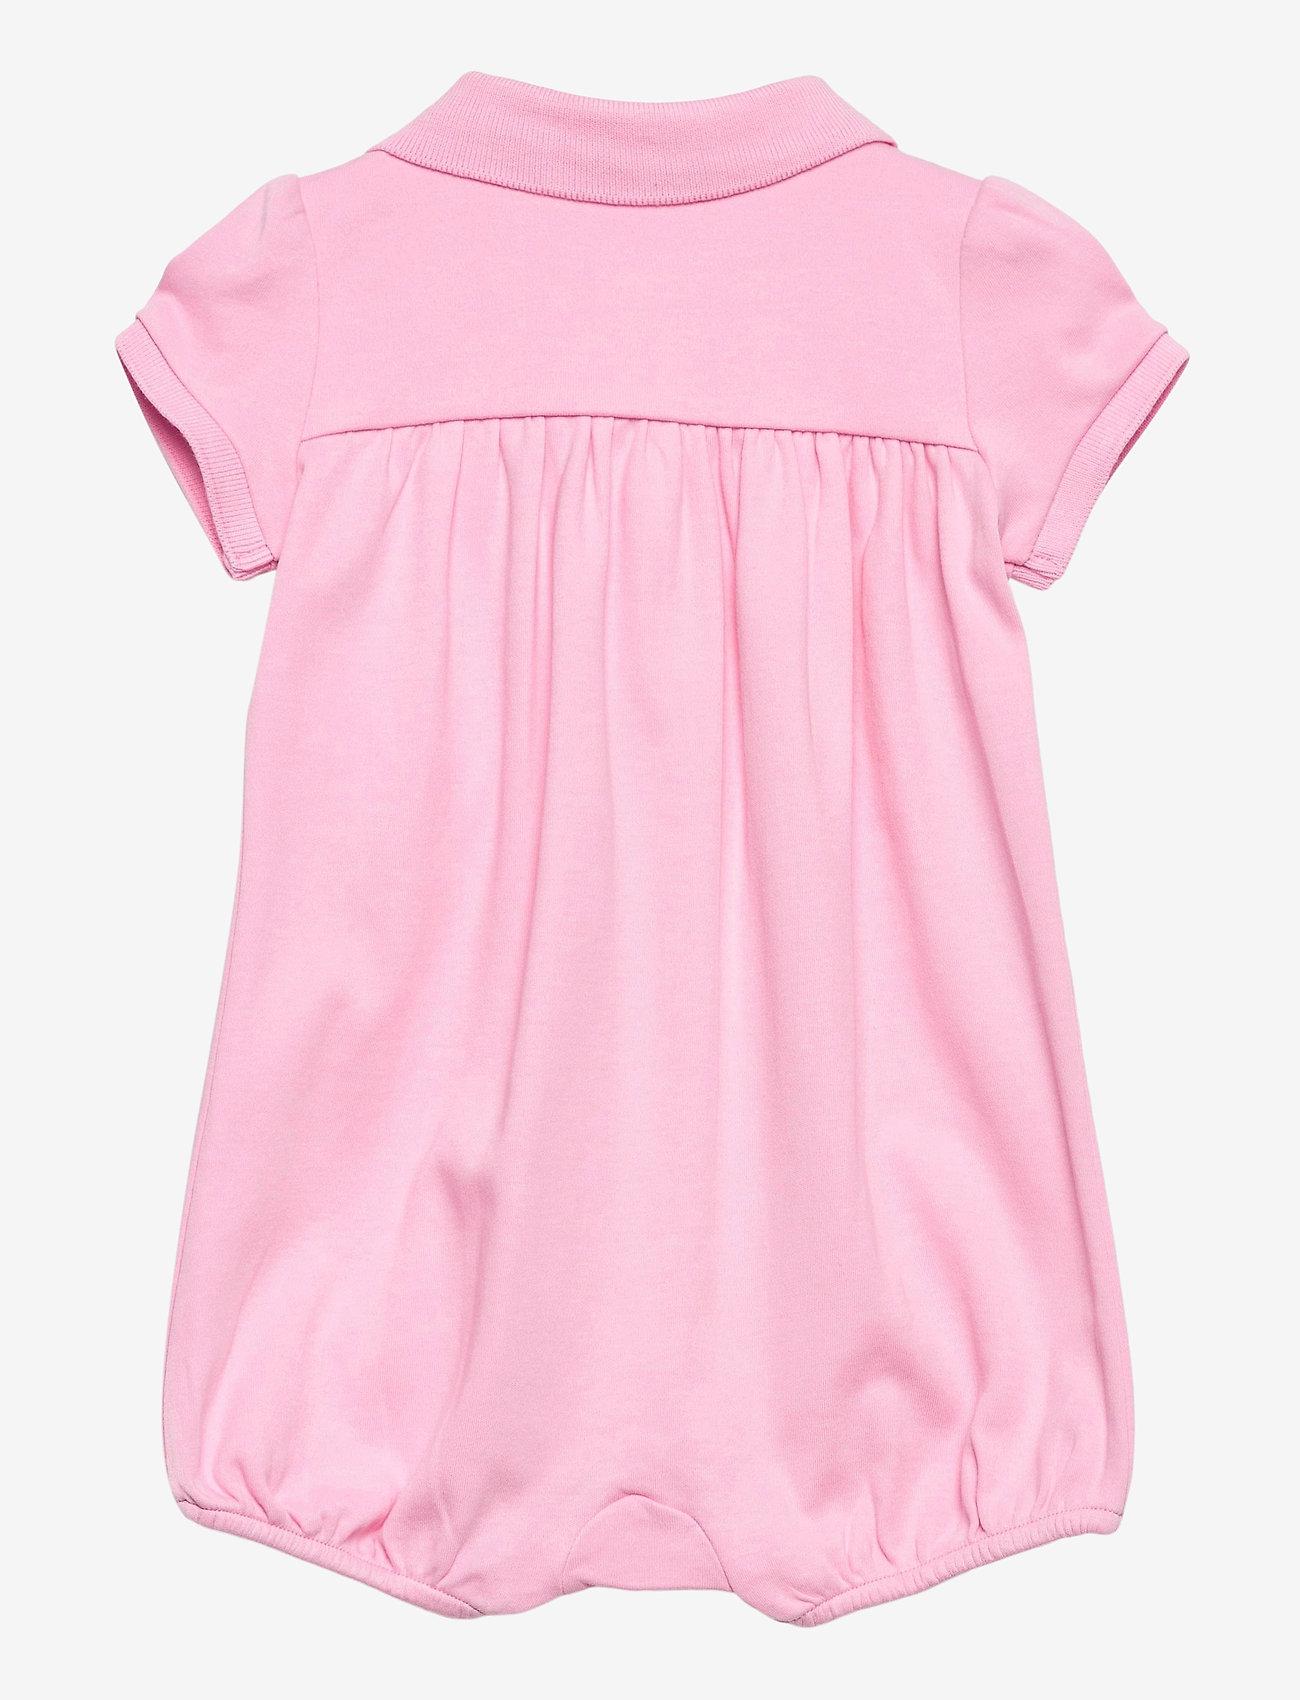 Ralph Lauren Baby - Interlock Bubble Shortall - kurzärmelige - carmel pink/white - 1